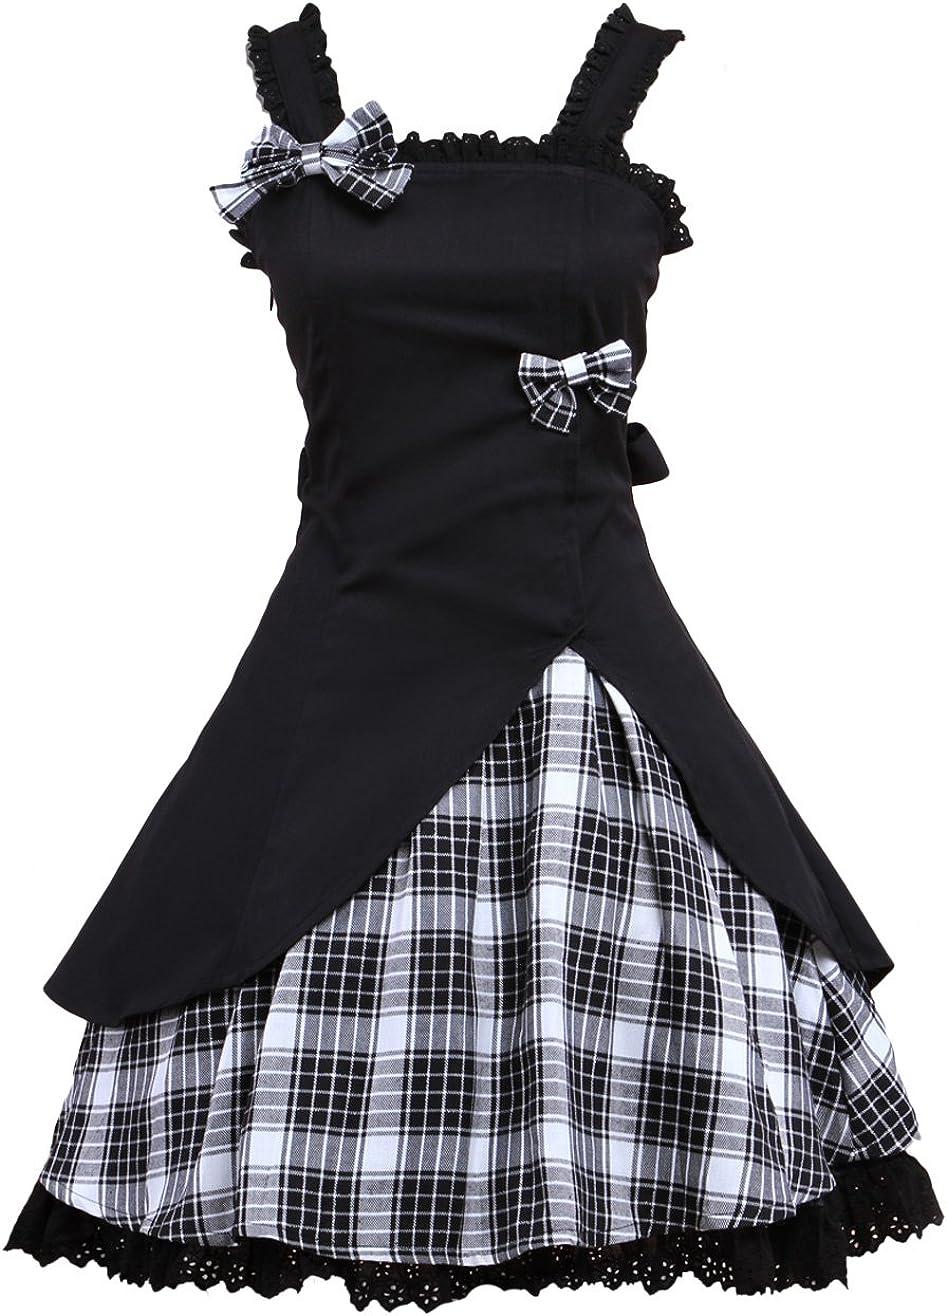 Hugme Classic Black Straps Neck Bow Cotton Lolita Jumper Skirt